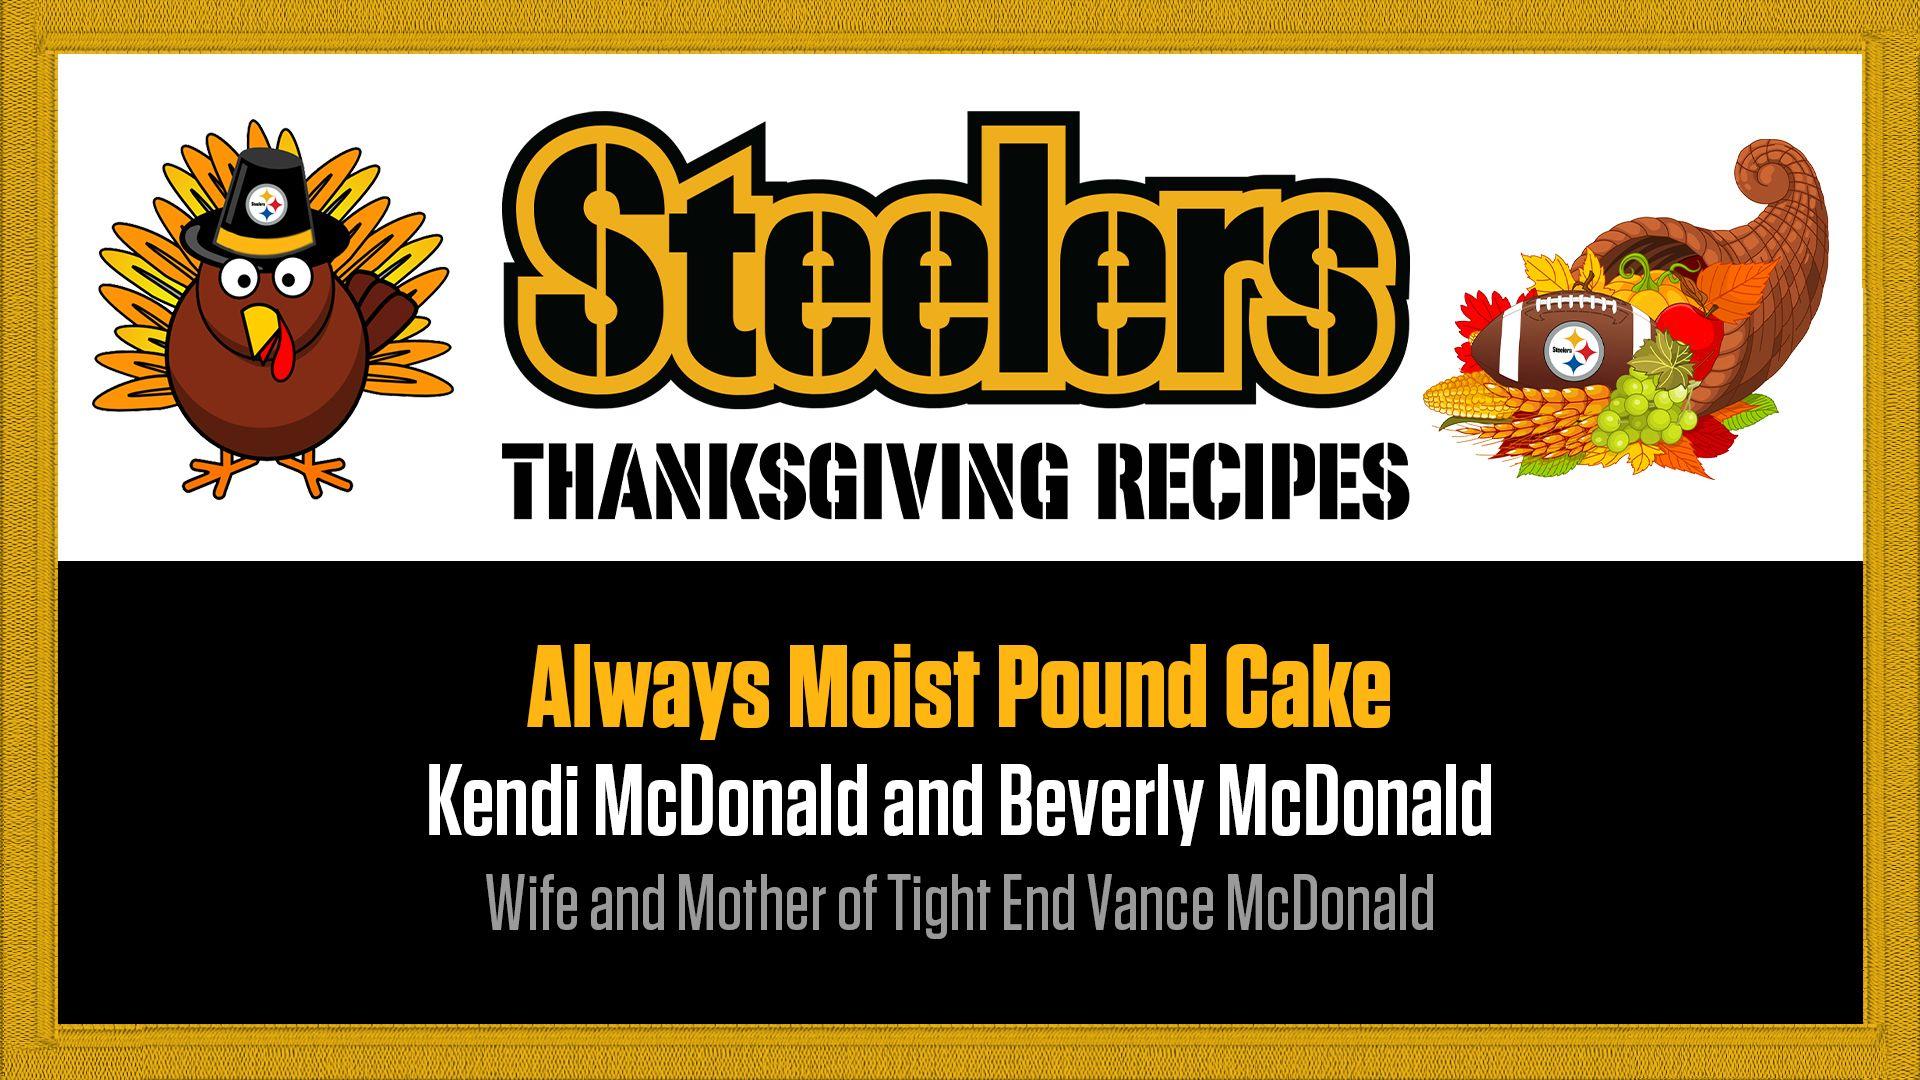 Recipe - always moist pound cake_the mcdonalds